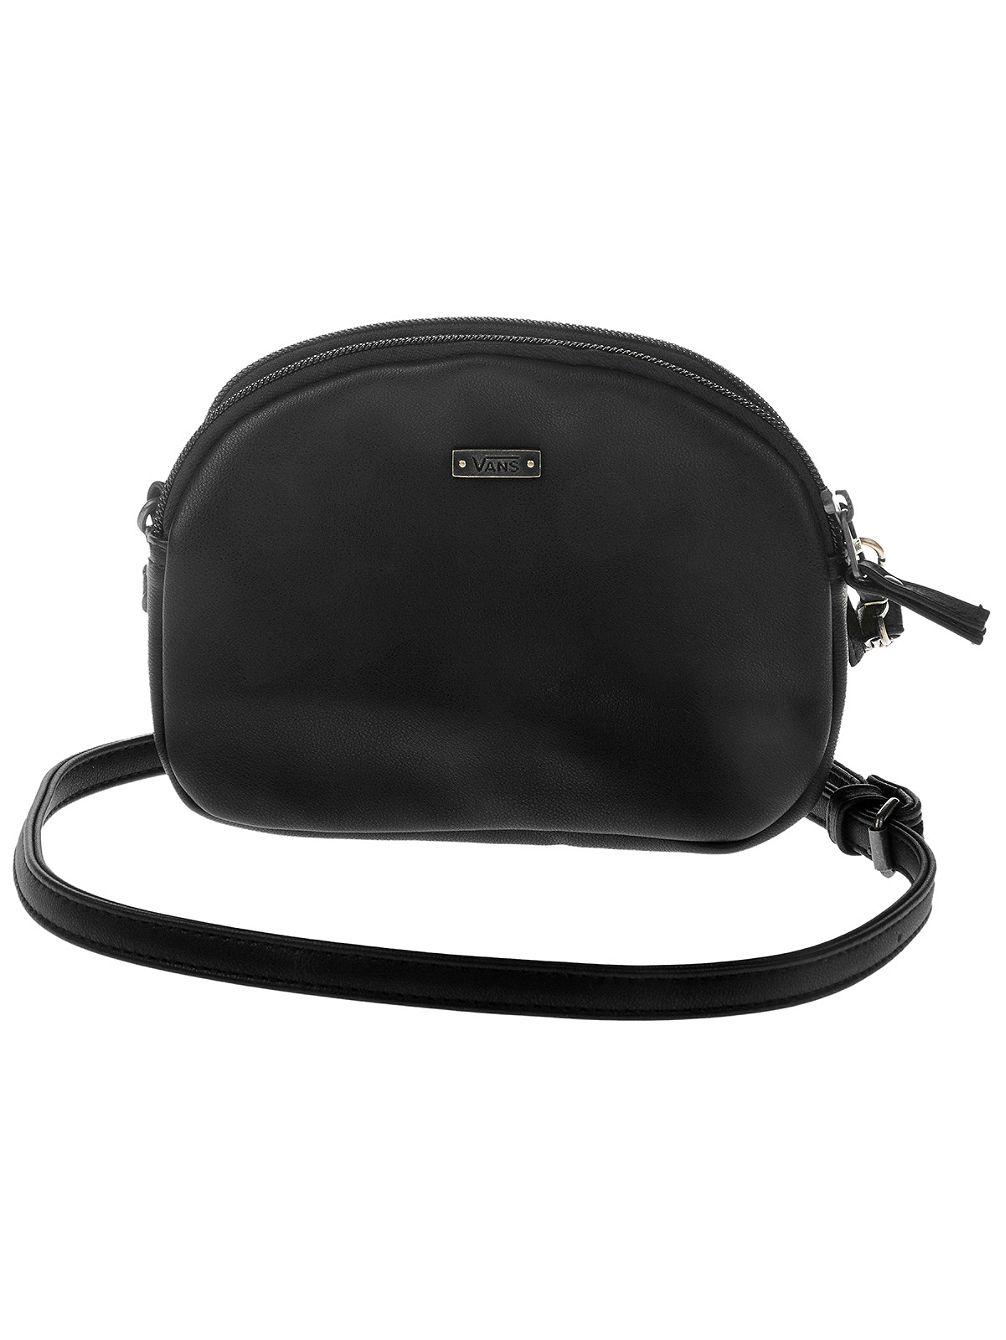 5abf4f8e18d Buy Vans Fiddle Crossbody Bag online at blue-tomato.com